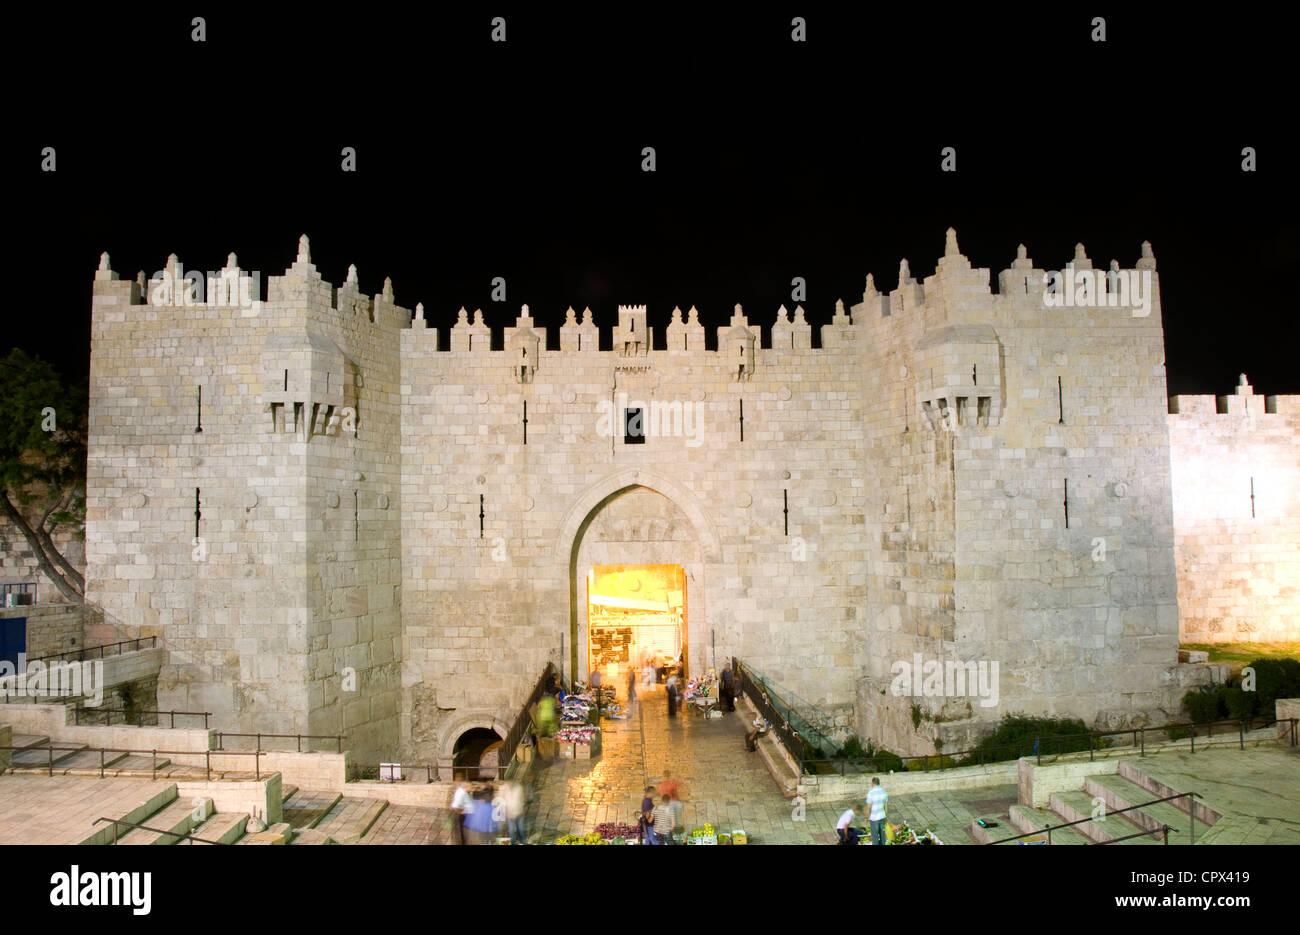 Damascus Gate entrance Old City Jerusalem Palestine Israel night light long exposure motion blur faces - Stock Image